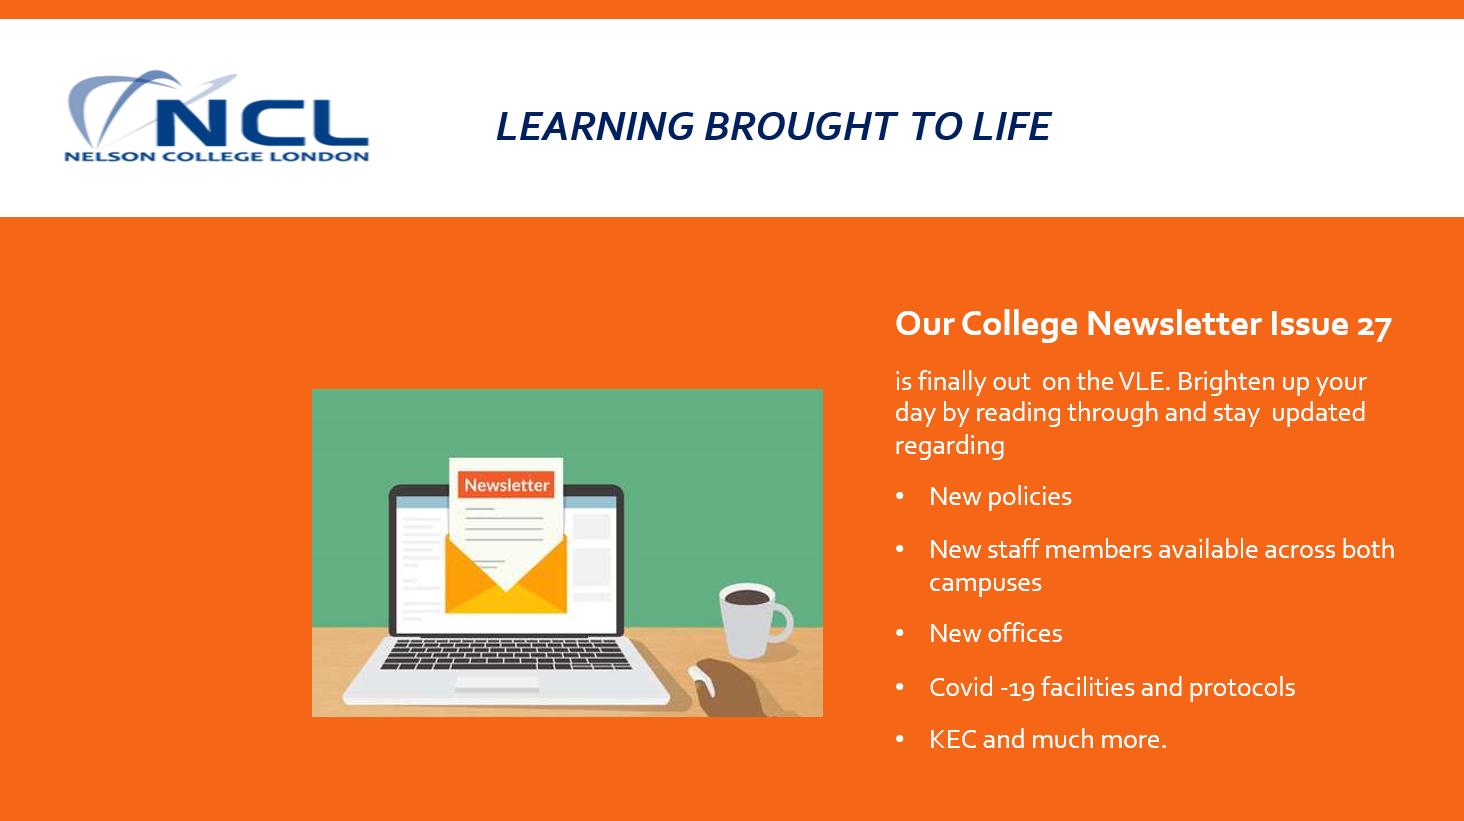 learning brought  to life - Learning brought  to life